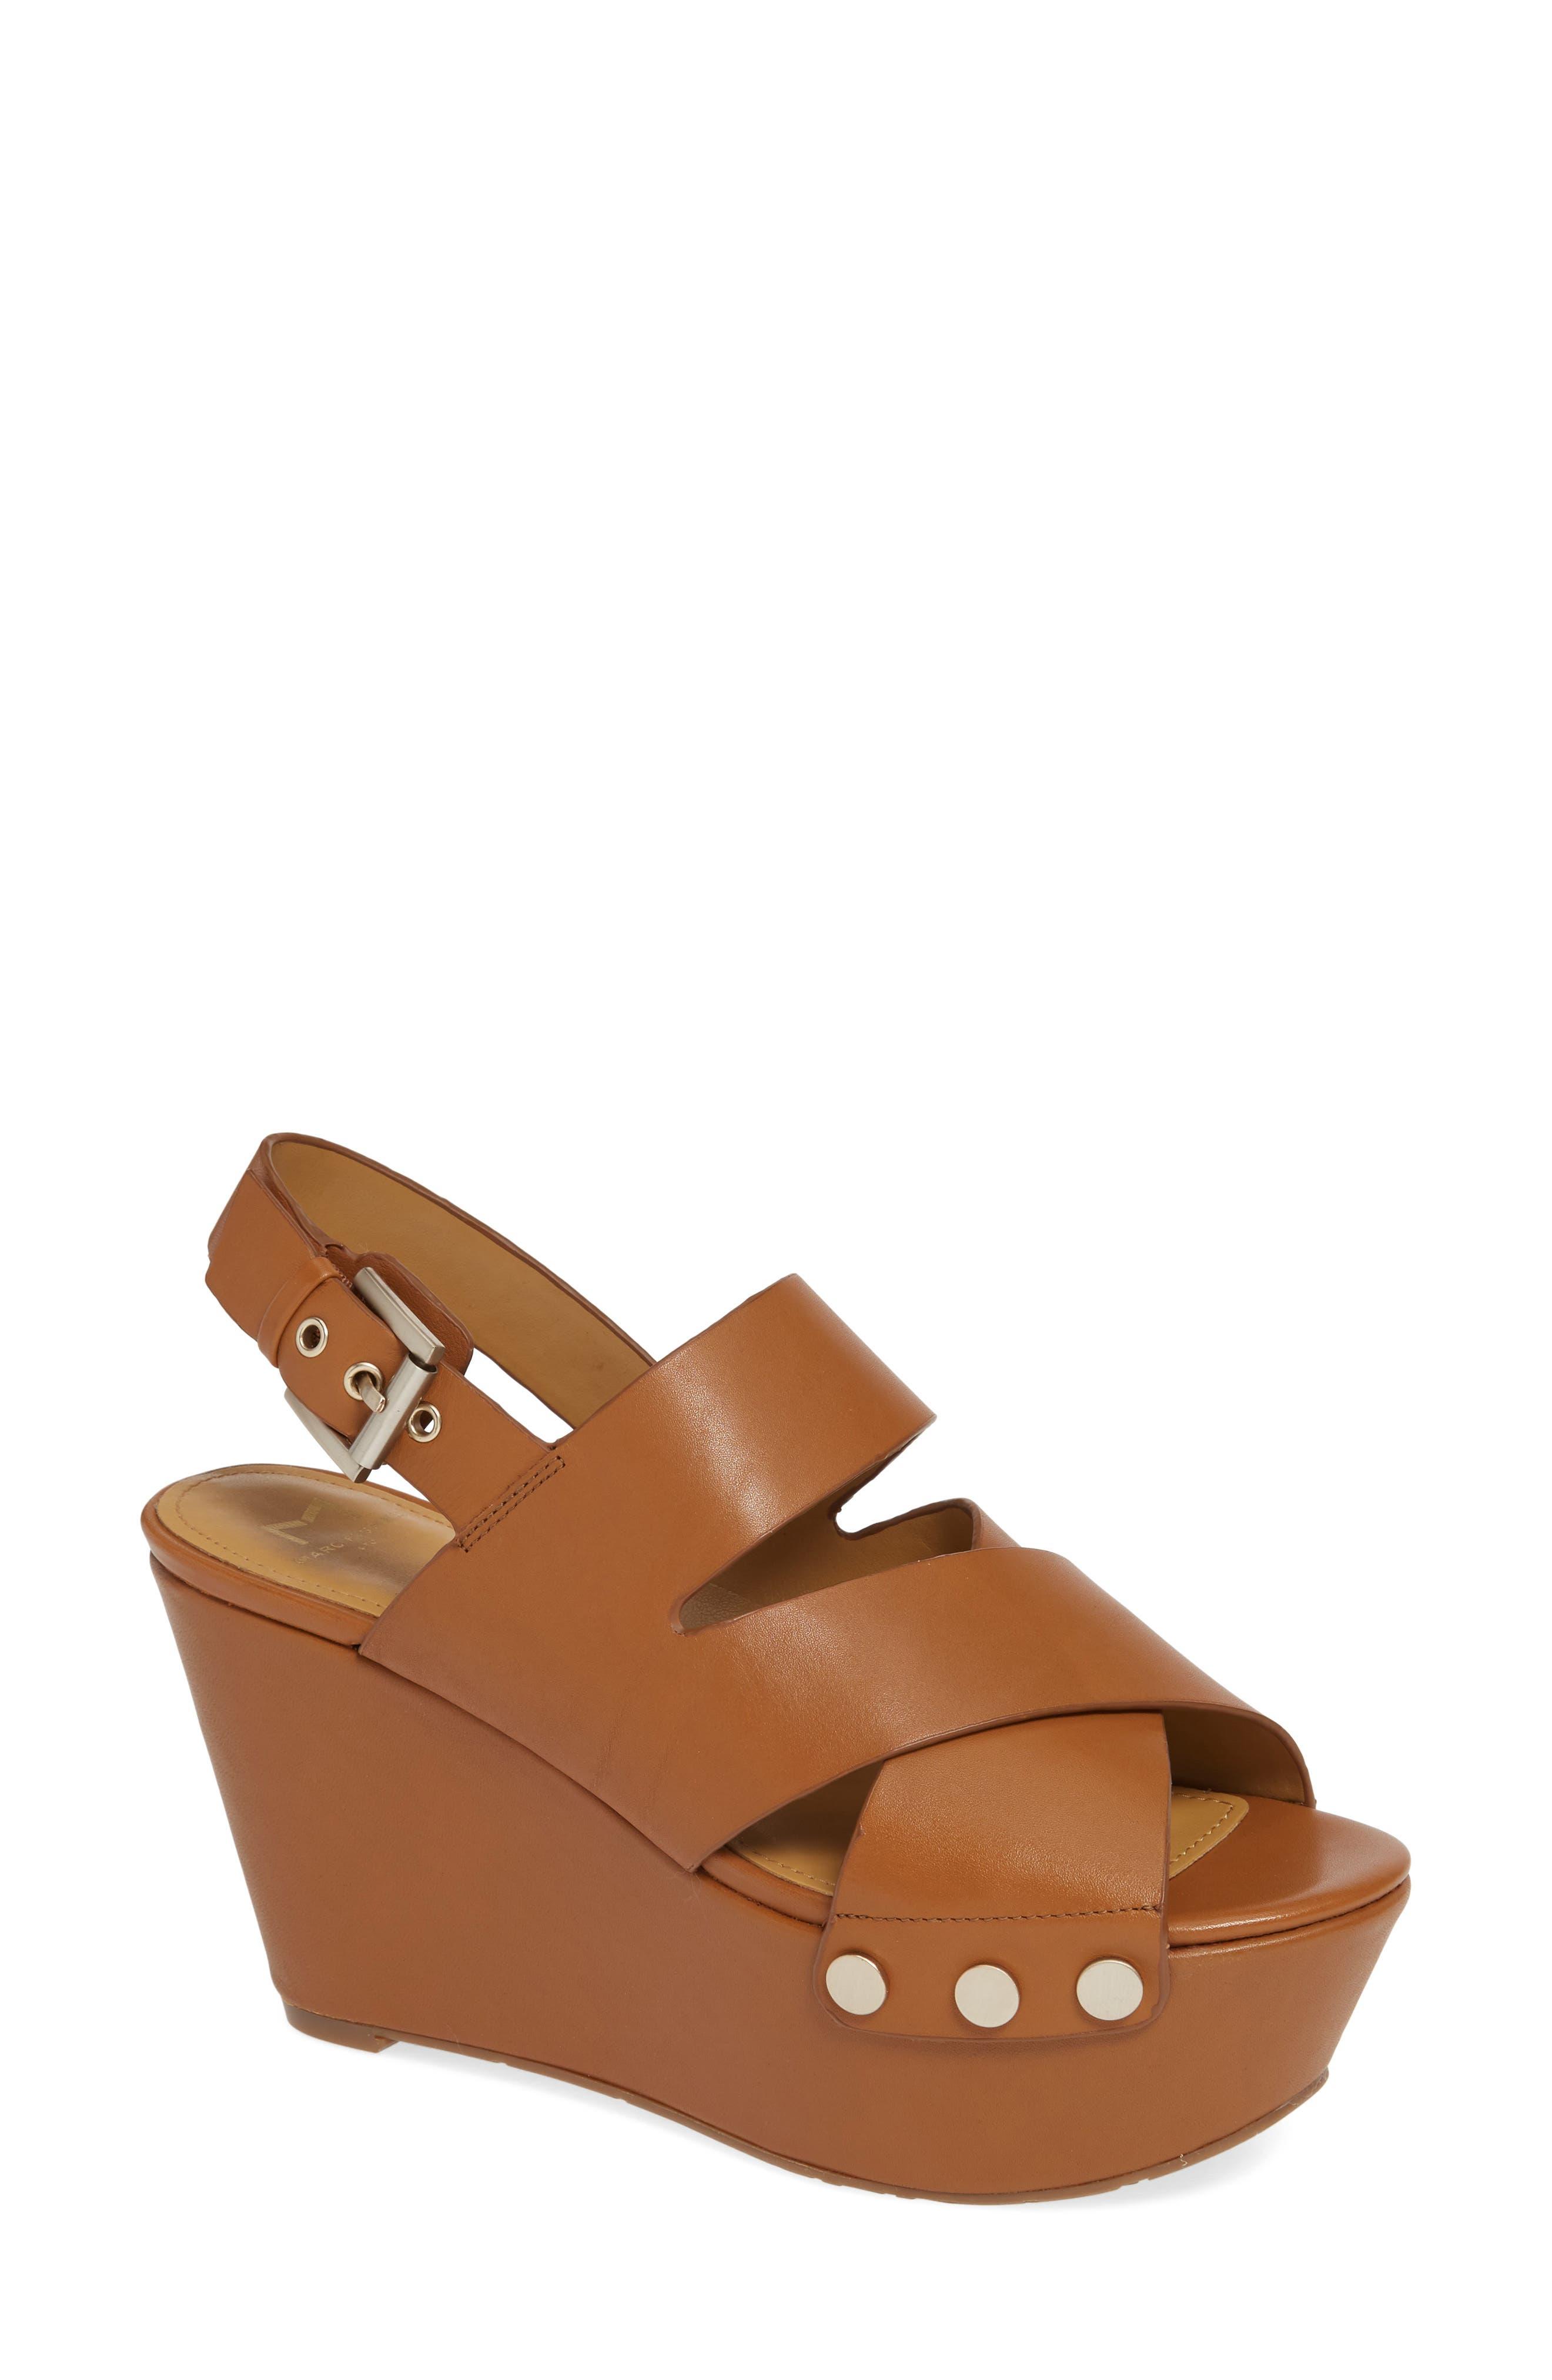 Bianka Platform Wedge Sandal,                             Main thumbnail 1, color,                             GINGER SNAP LEATHER